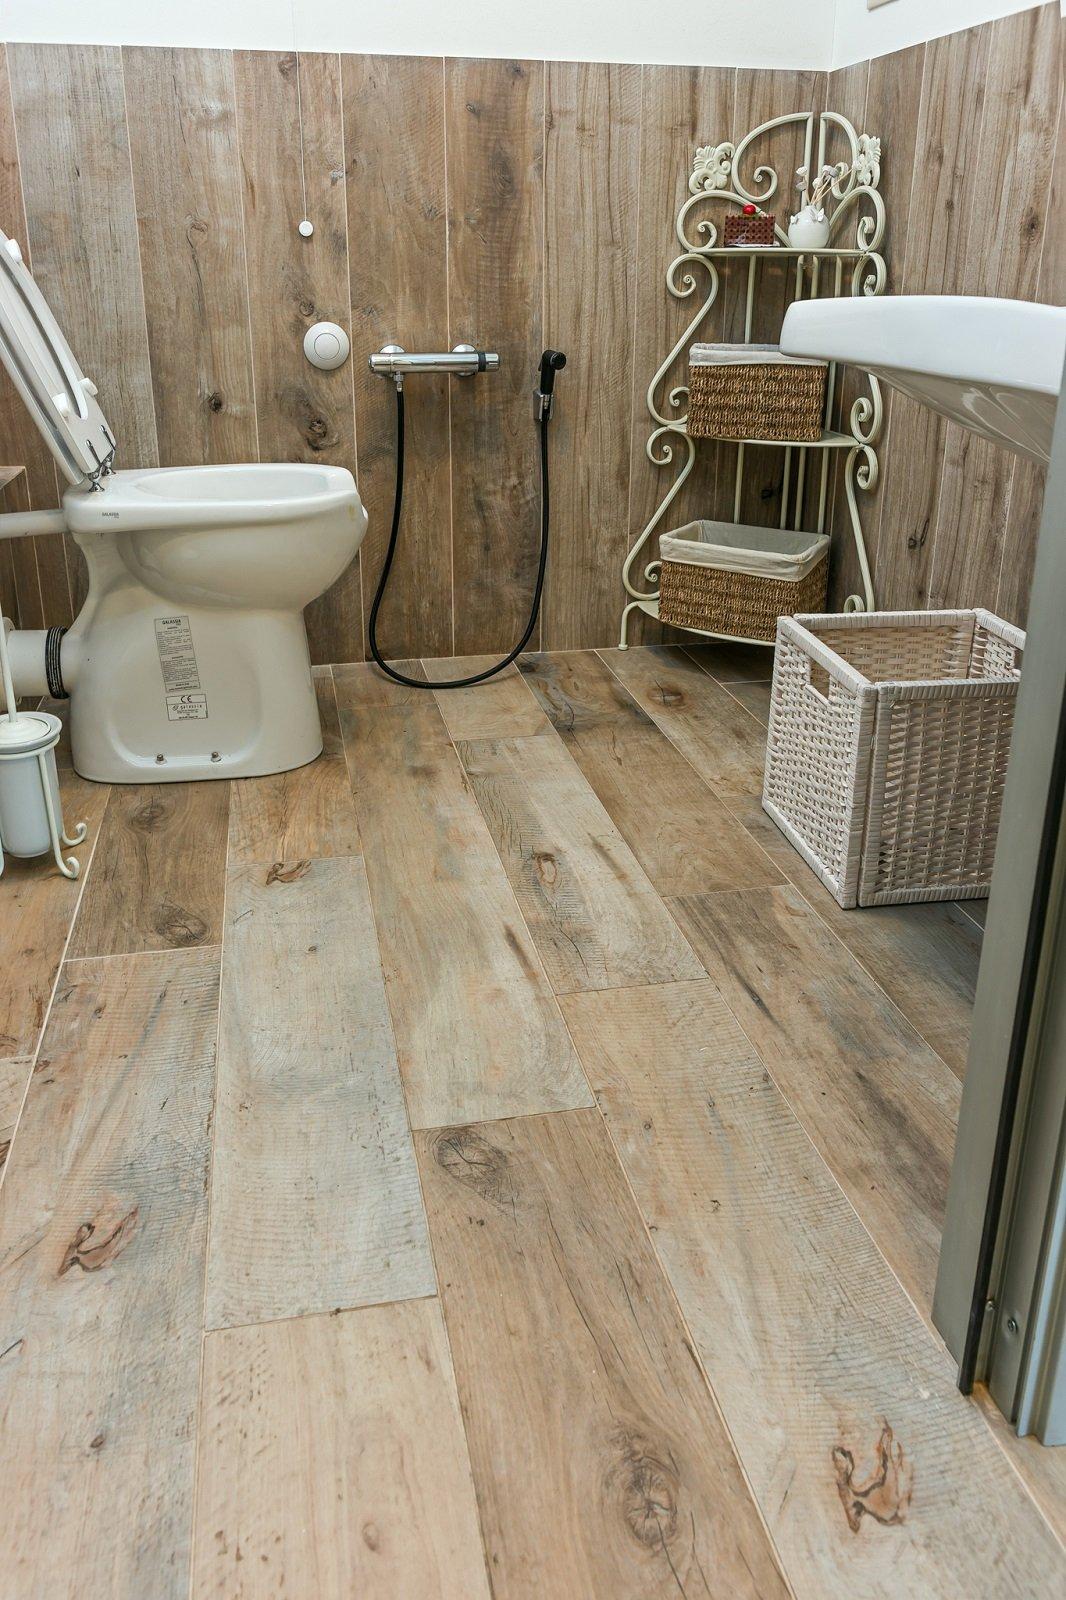 Pavimento effetto legno bagno kj94 regardsdefemmes - Pavimento e rivestimento bagno uguale ...